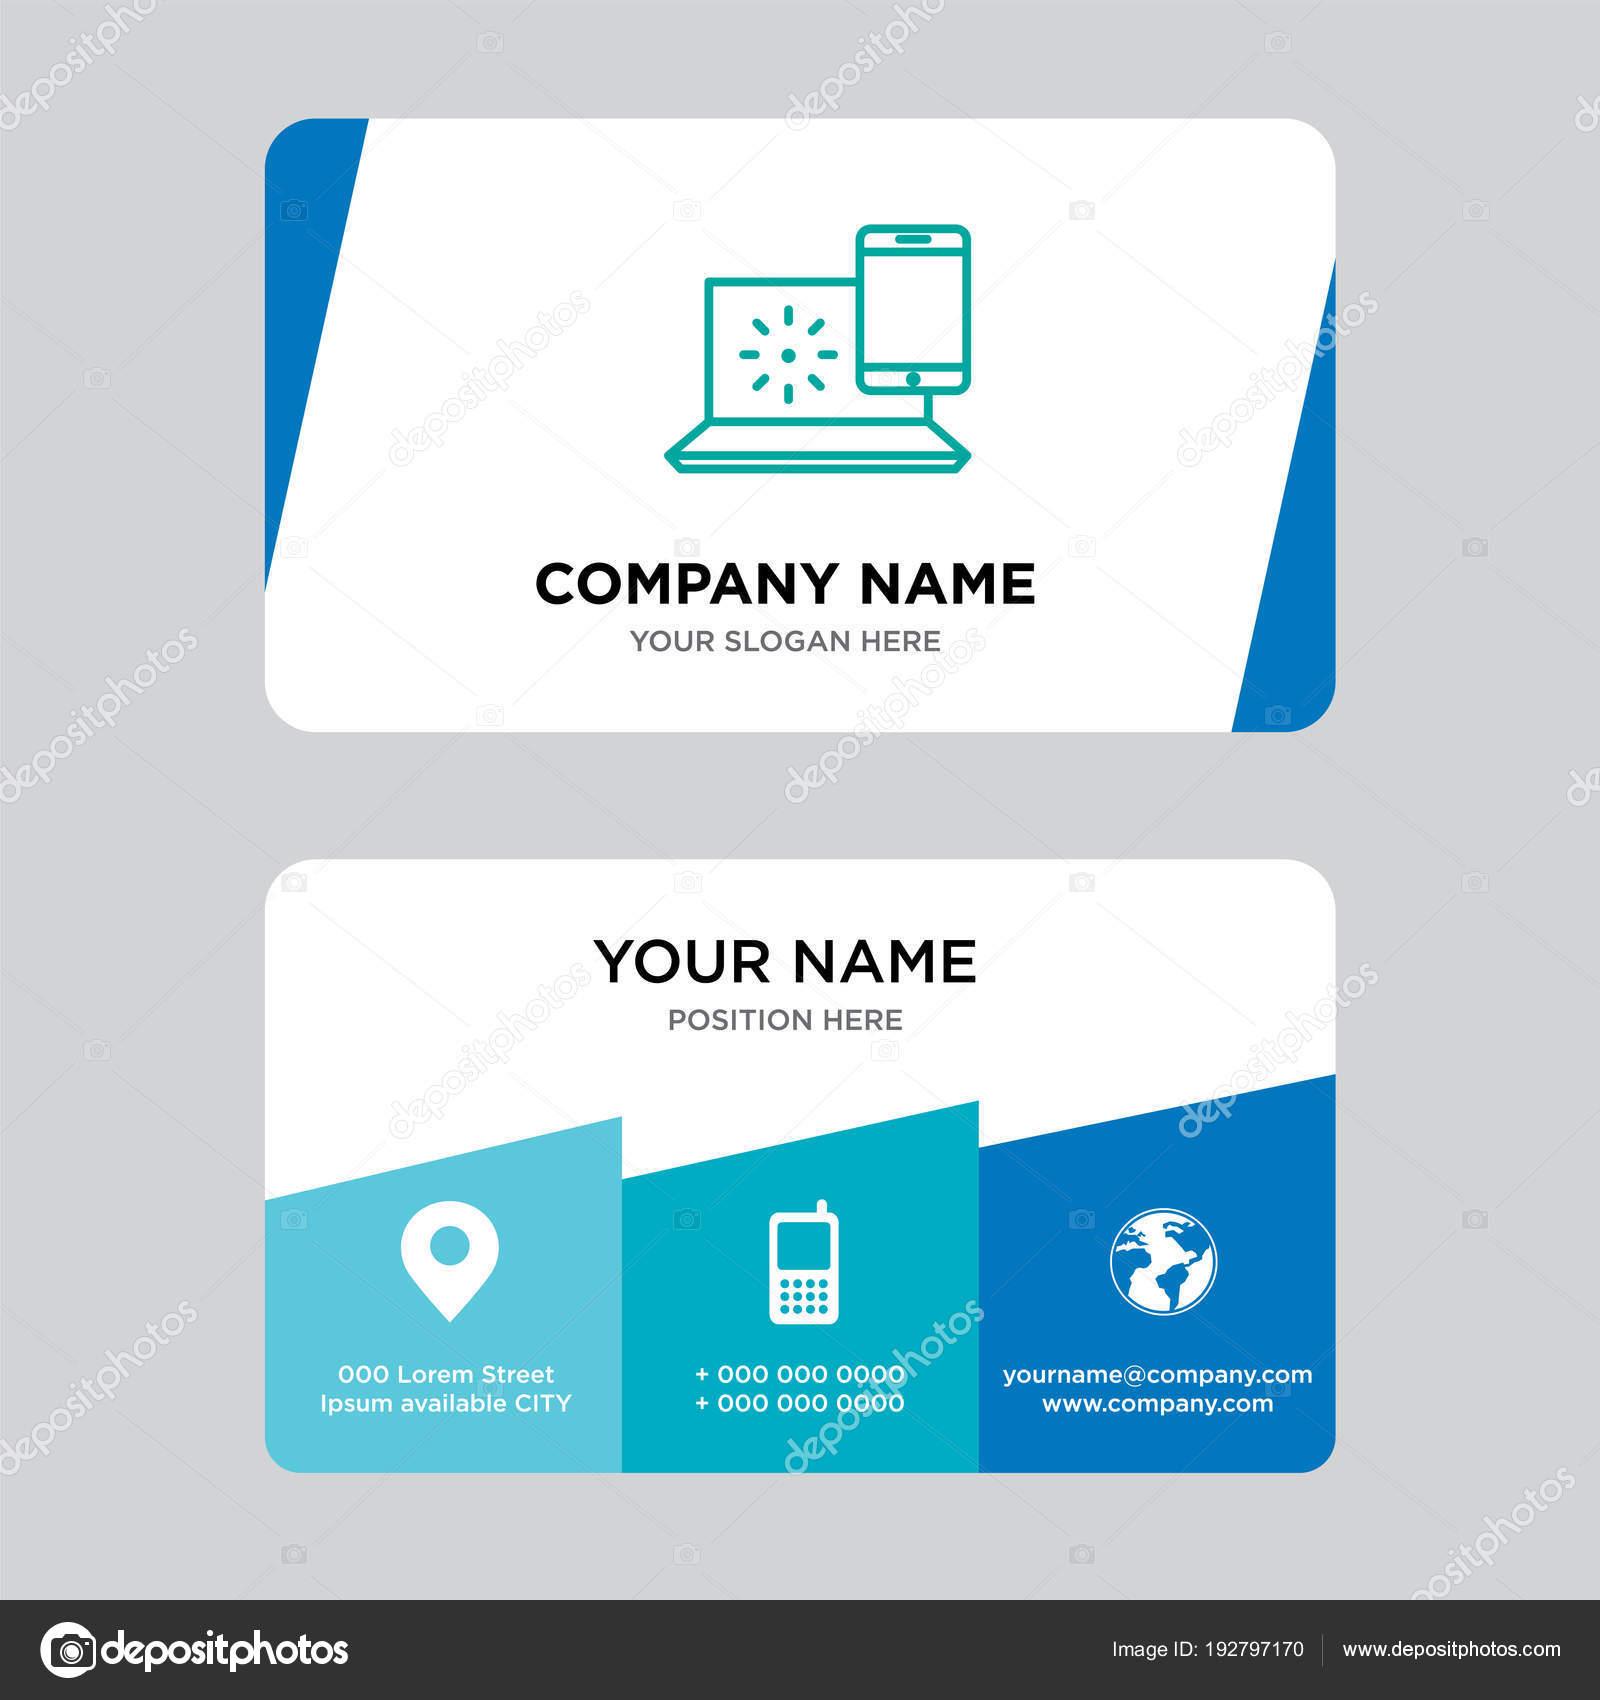 Internet business card design template stock vector internet business card design template stock vector colourmoves